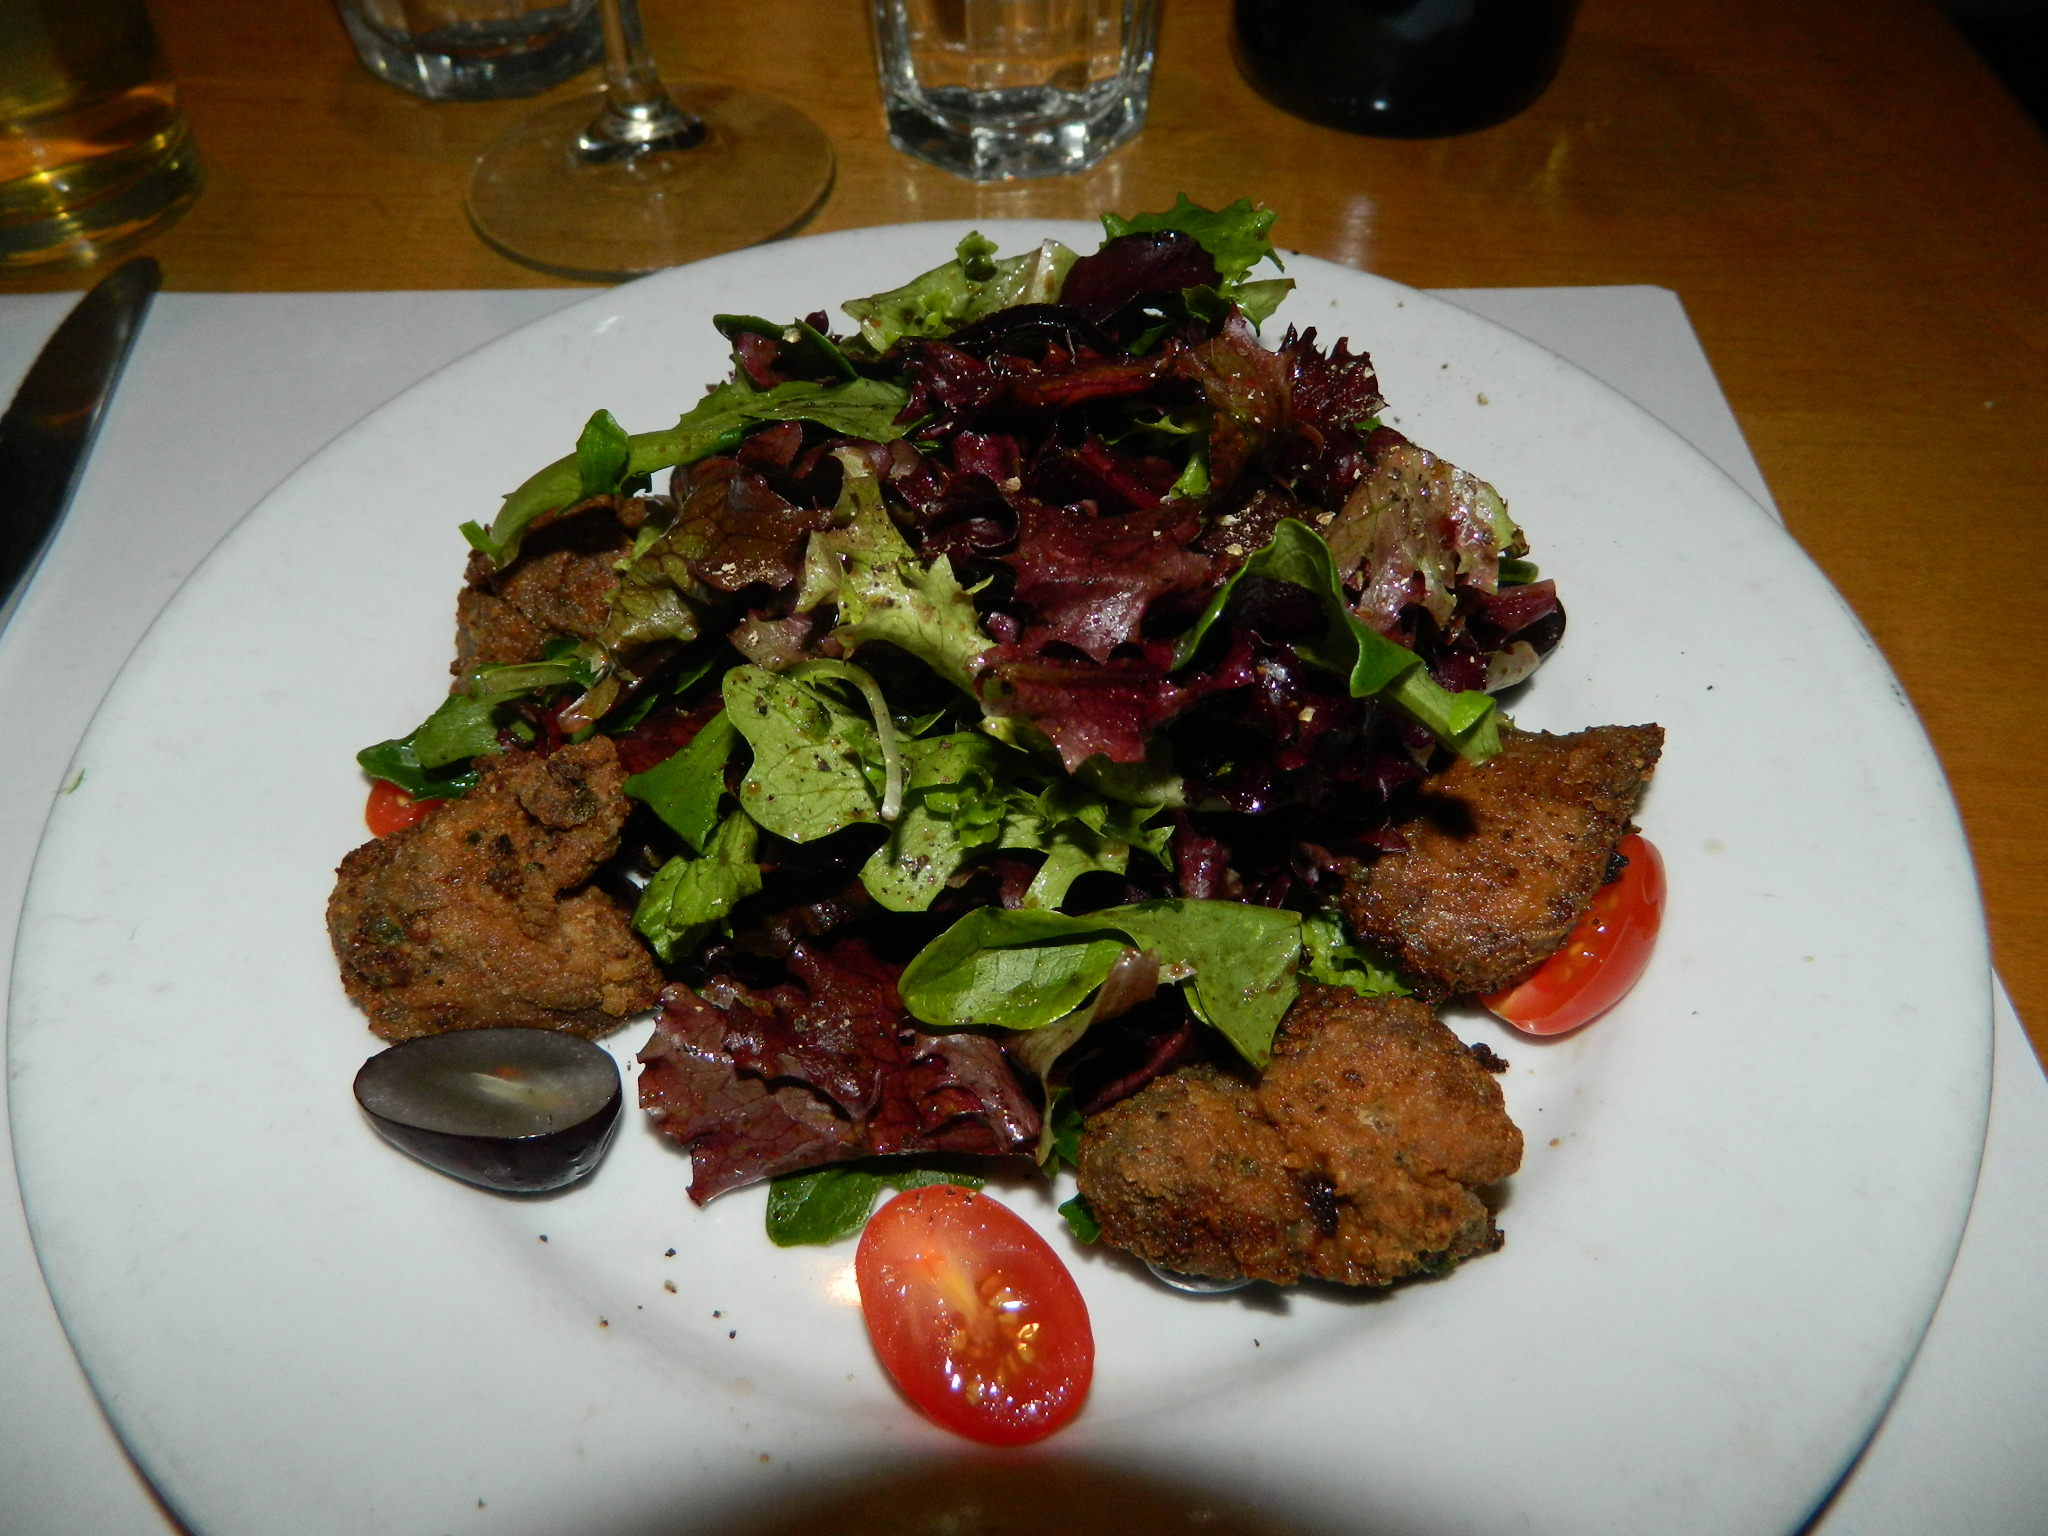 Deep fried Chicken livers